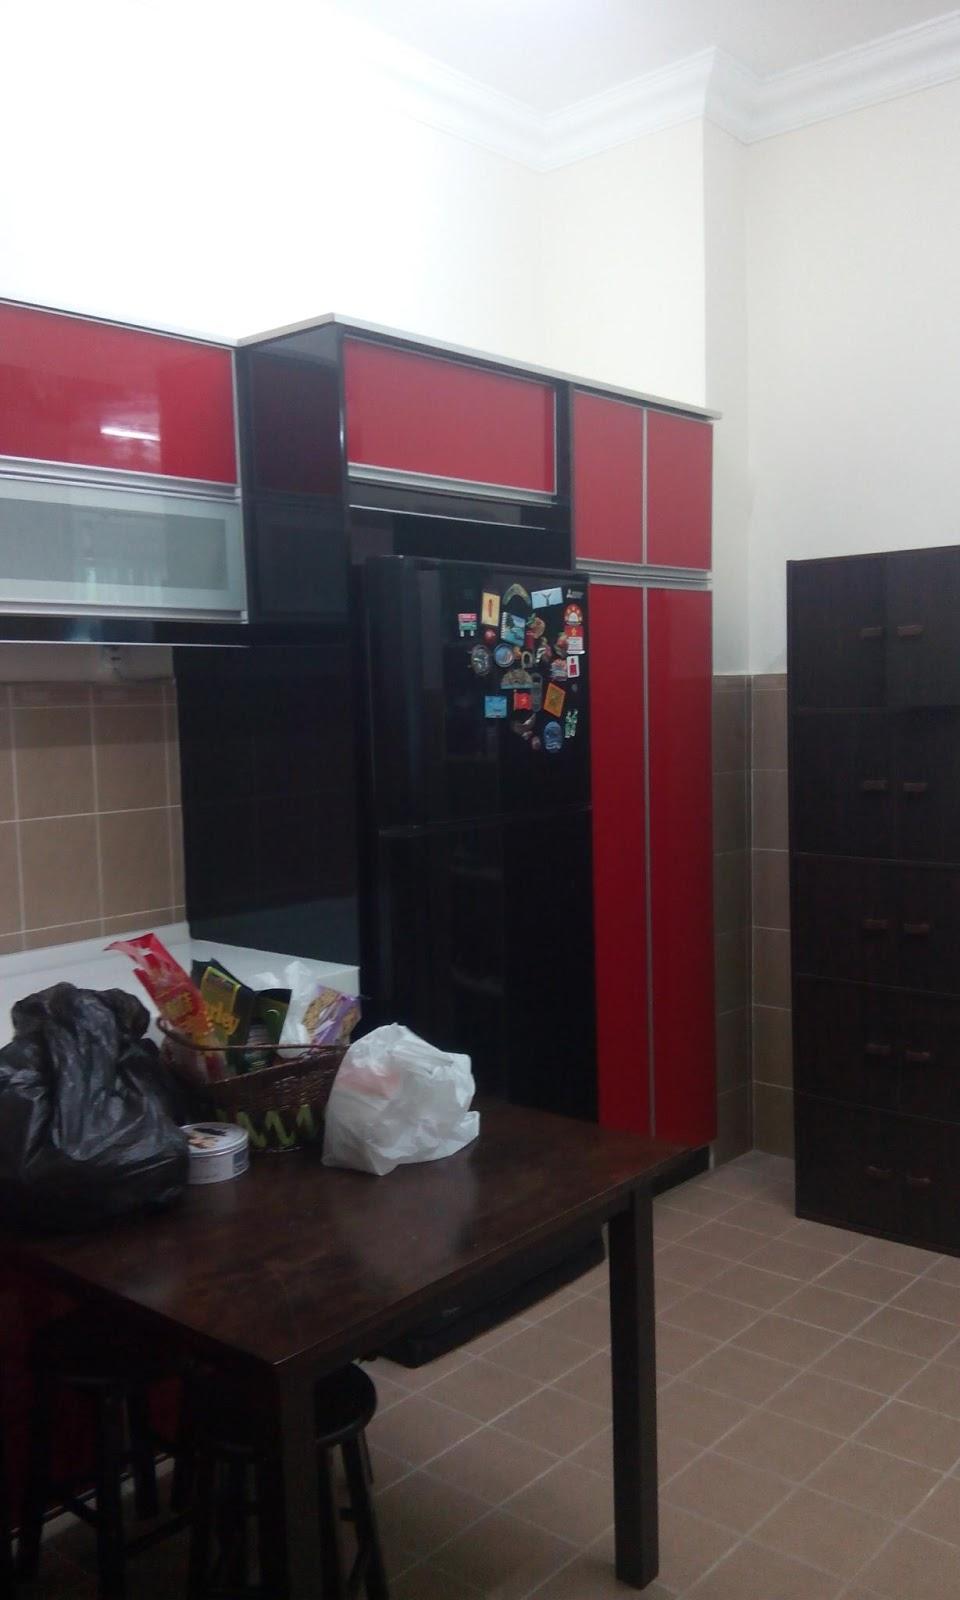 Untuk Carcas Atau Body Cabinet Kami Menggunakan Warna Hitam Glossy Sebab Tu Jadi Tiga Kaler Kabinet Dapur Ni Namun Begitu Ia Tetap Memberi Impak